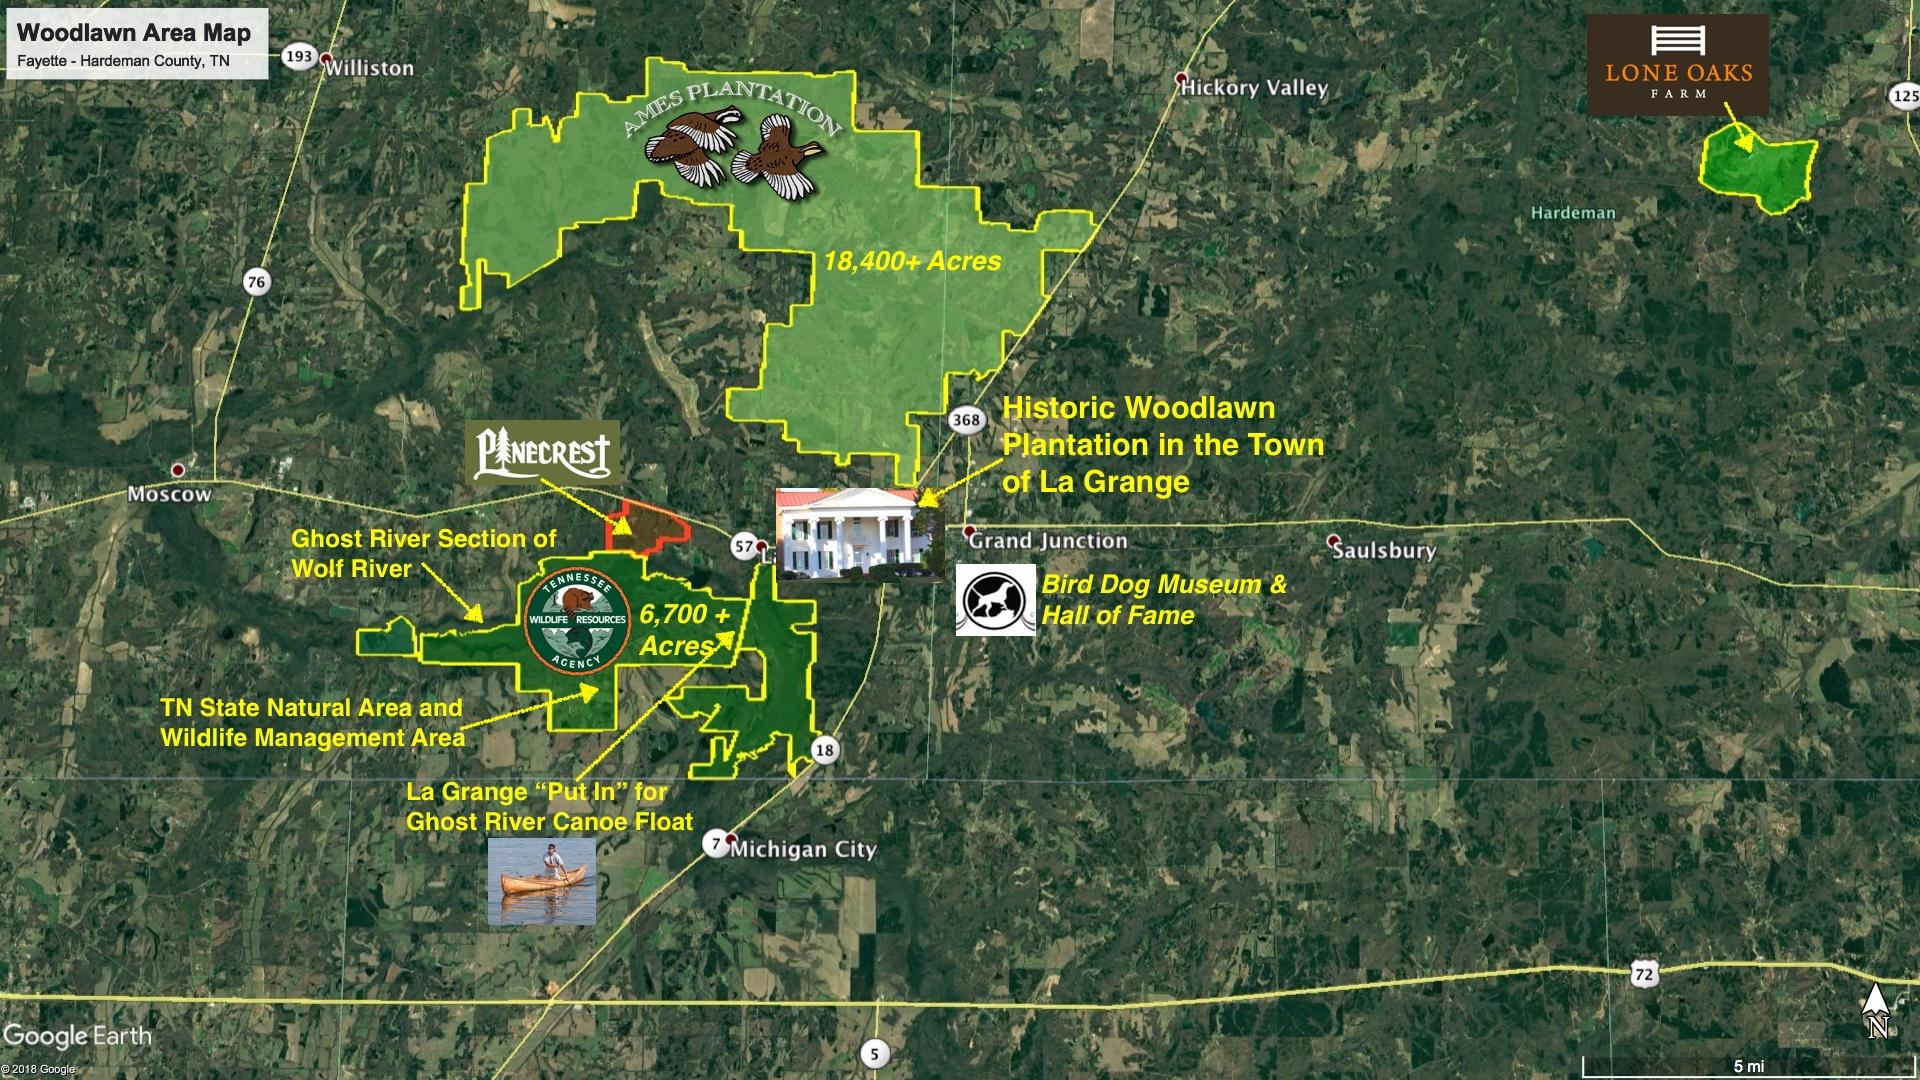 Woodlawn Area Map- Wide.jpg